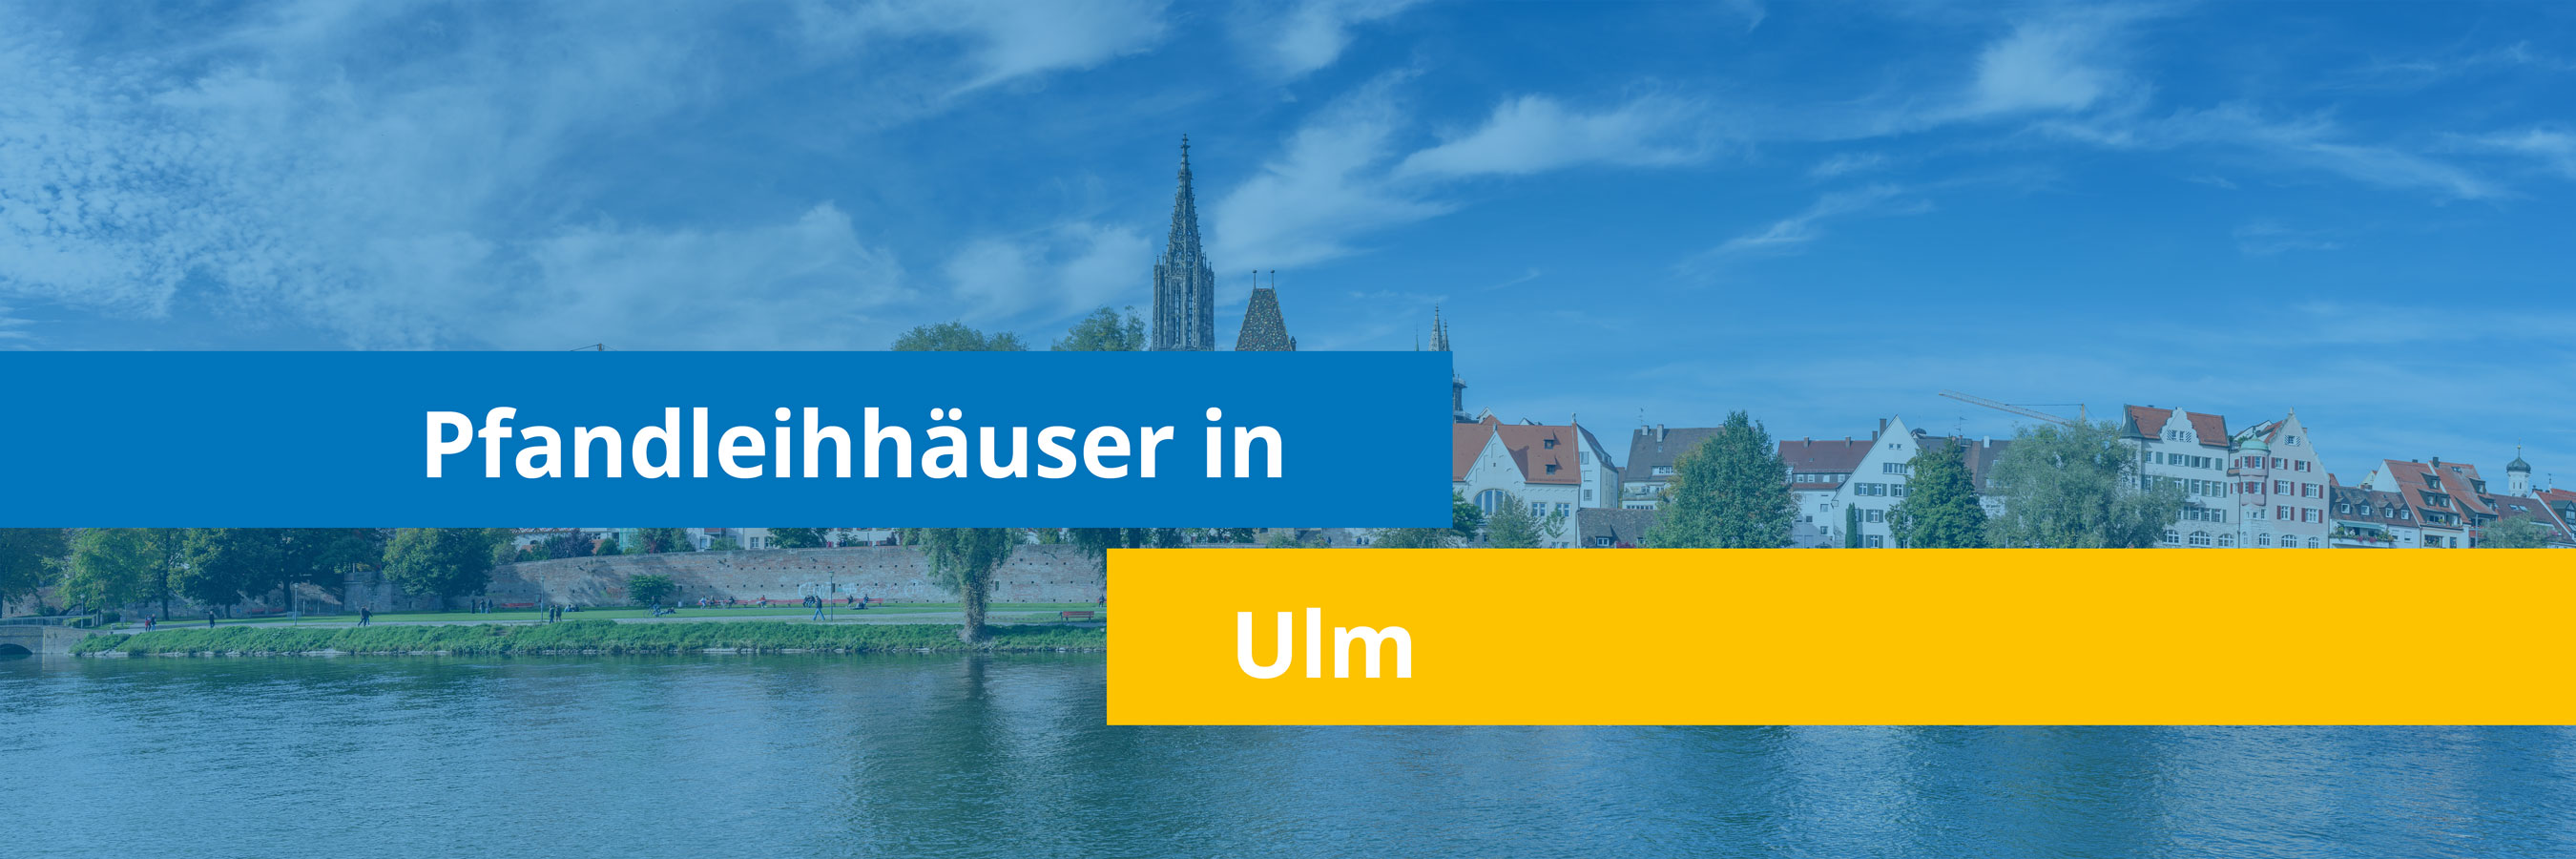 Leihhäuser in Ulm